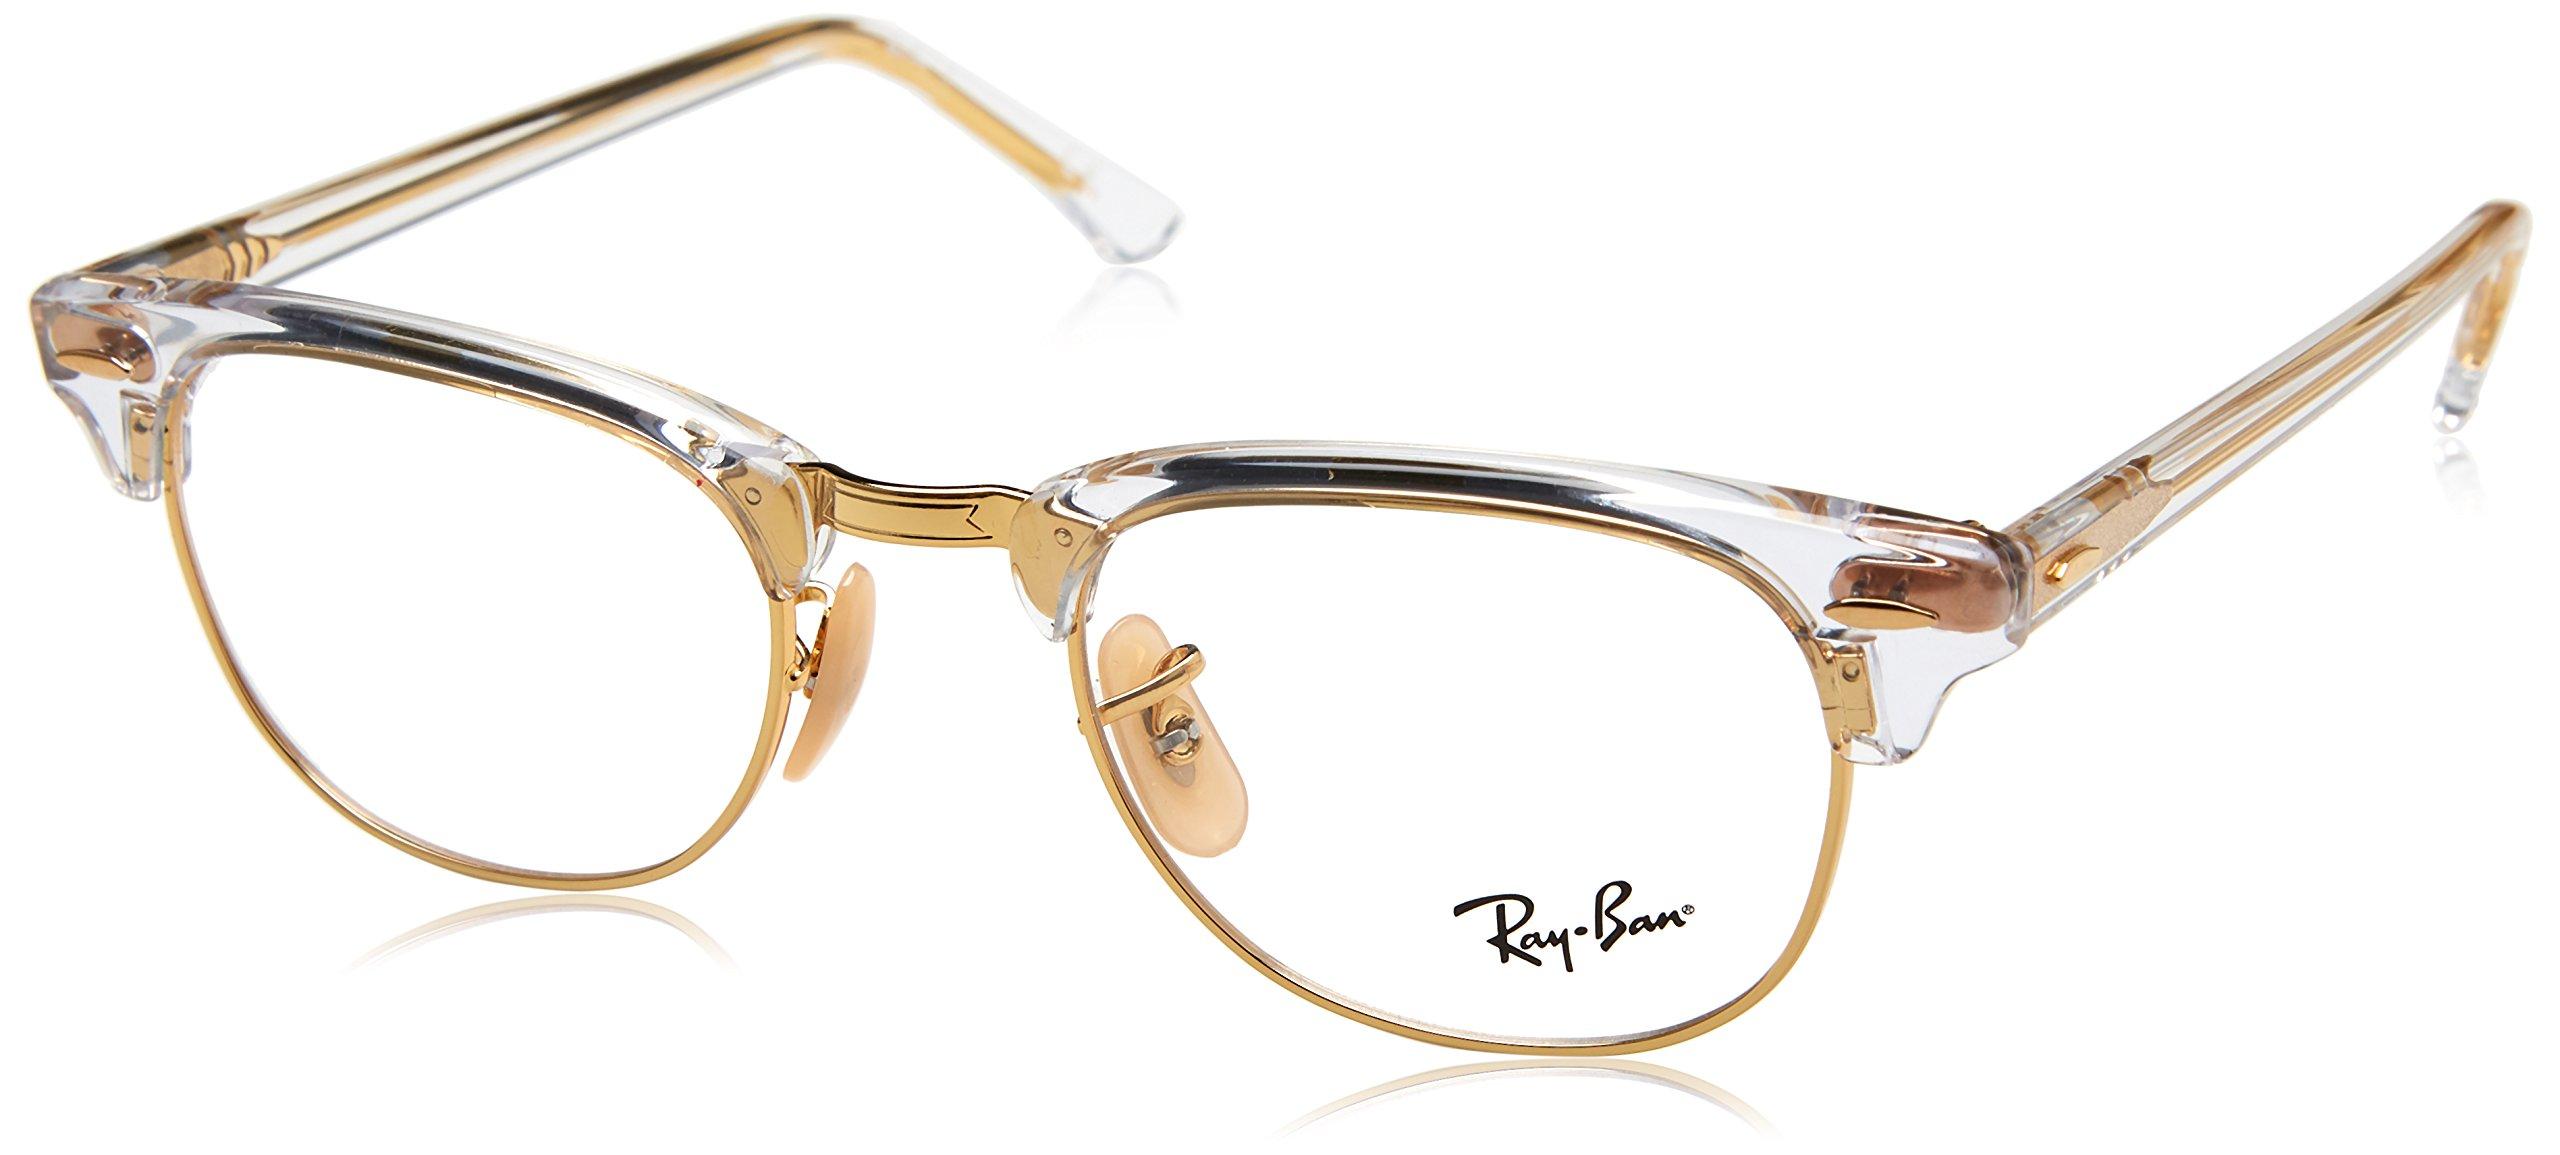 Ray-Ban Clubmaster No Polarization Square Prescription Eyewear Frame, Transparent, 51 mm